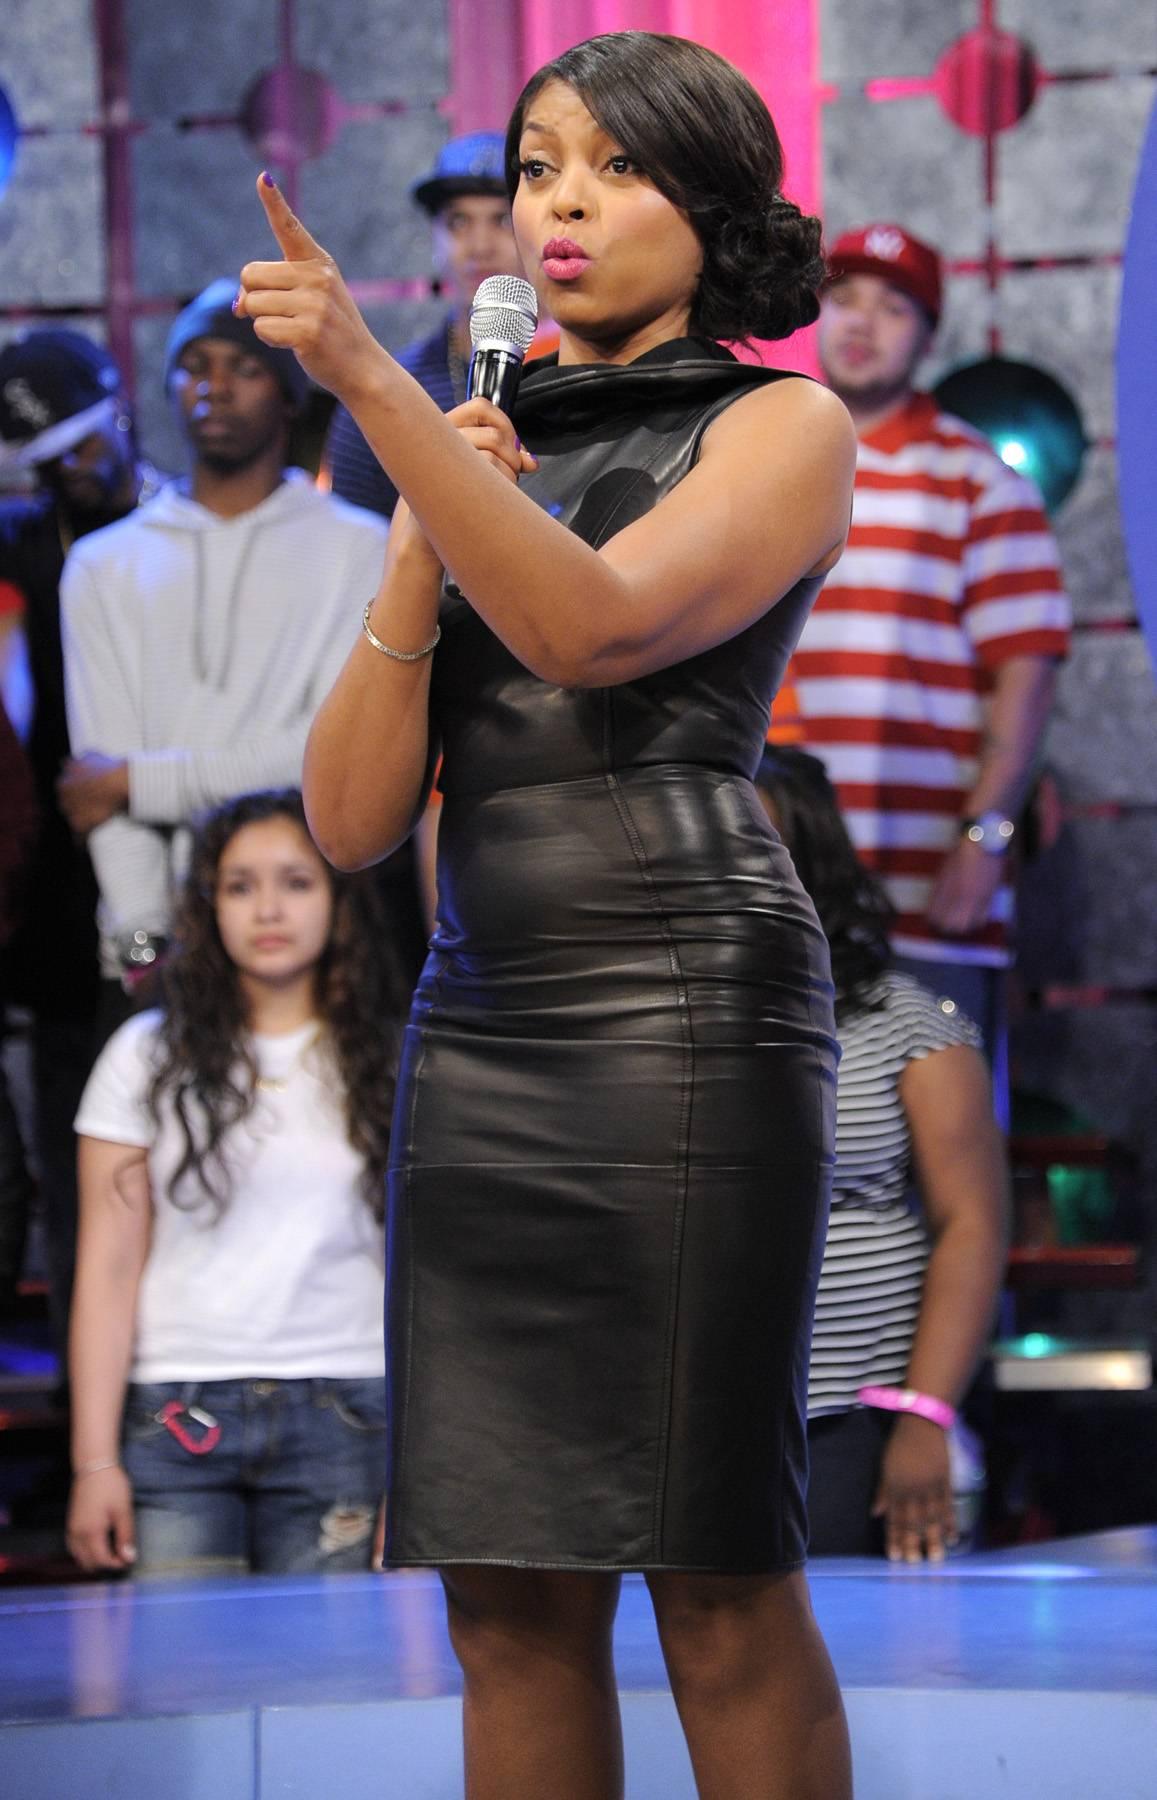 One Love - Taraji P. Henson at 106 & Park, April 17, 2012. (Photo: John Ricard/BET)